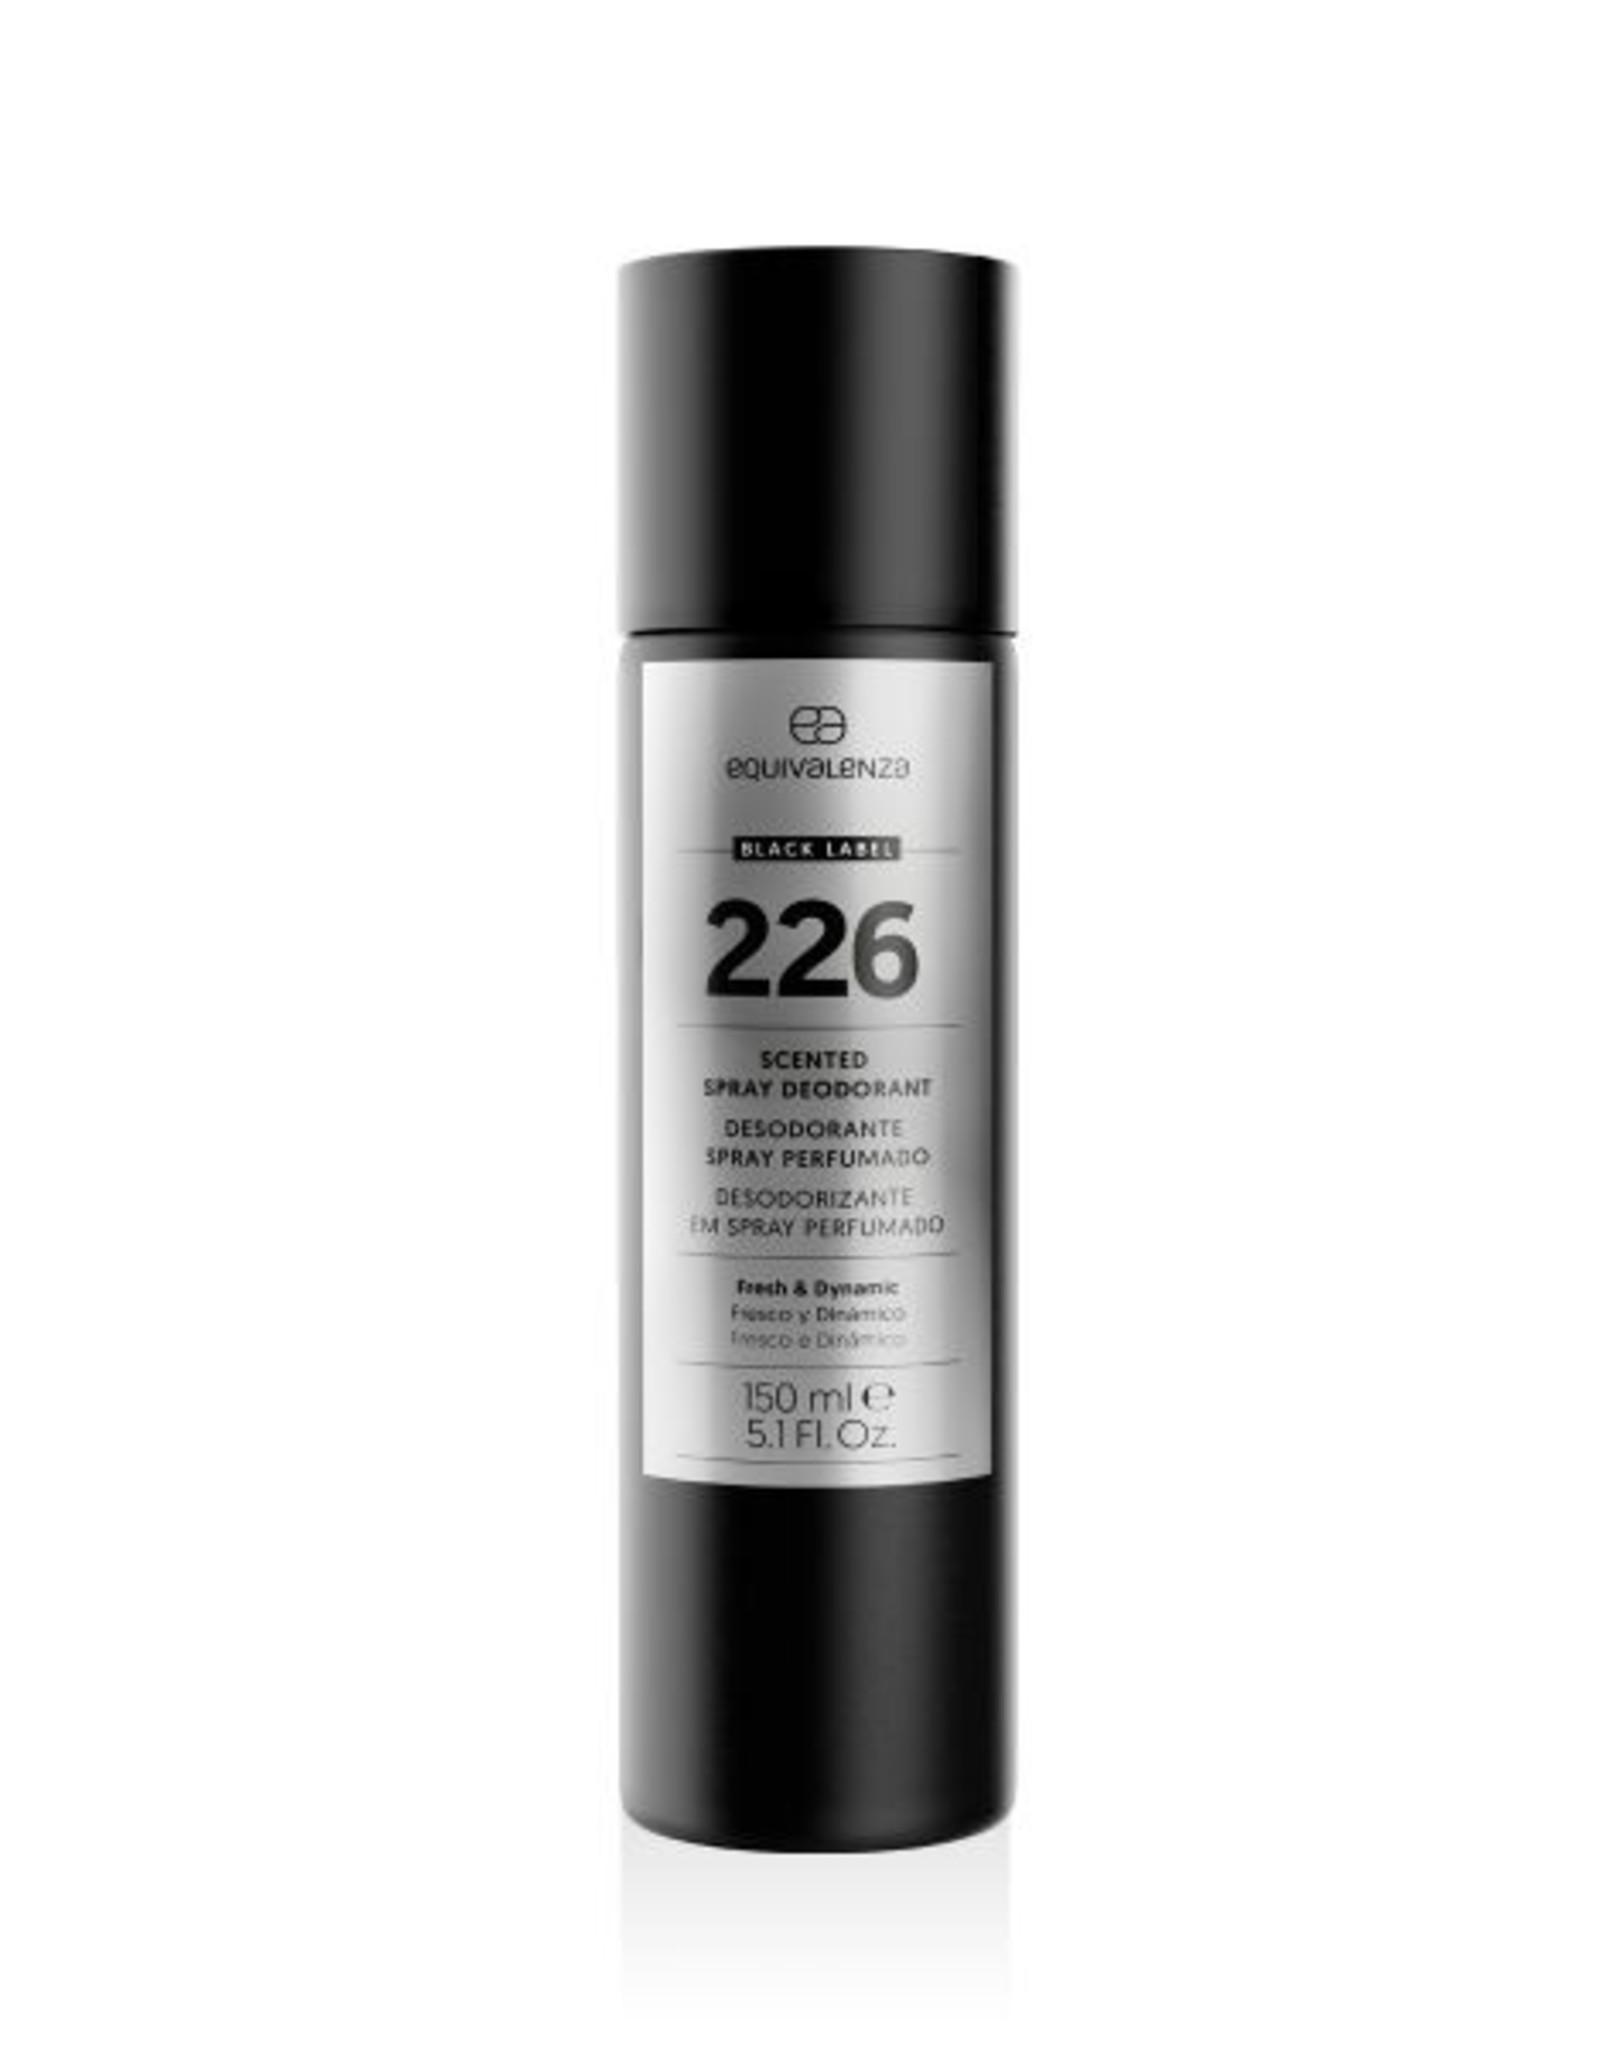 Equivalenza Black Label Deodorant 226